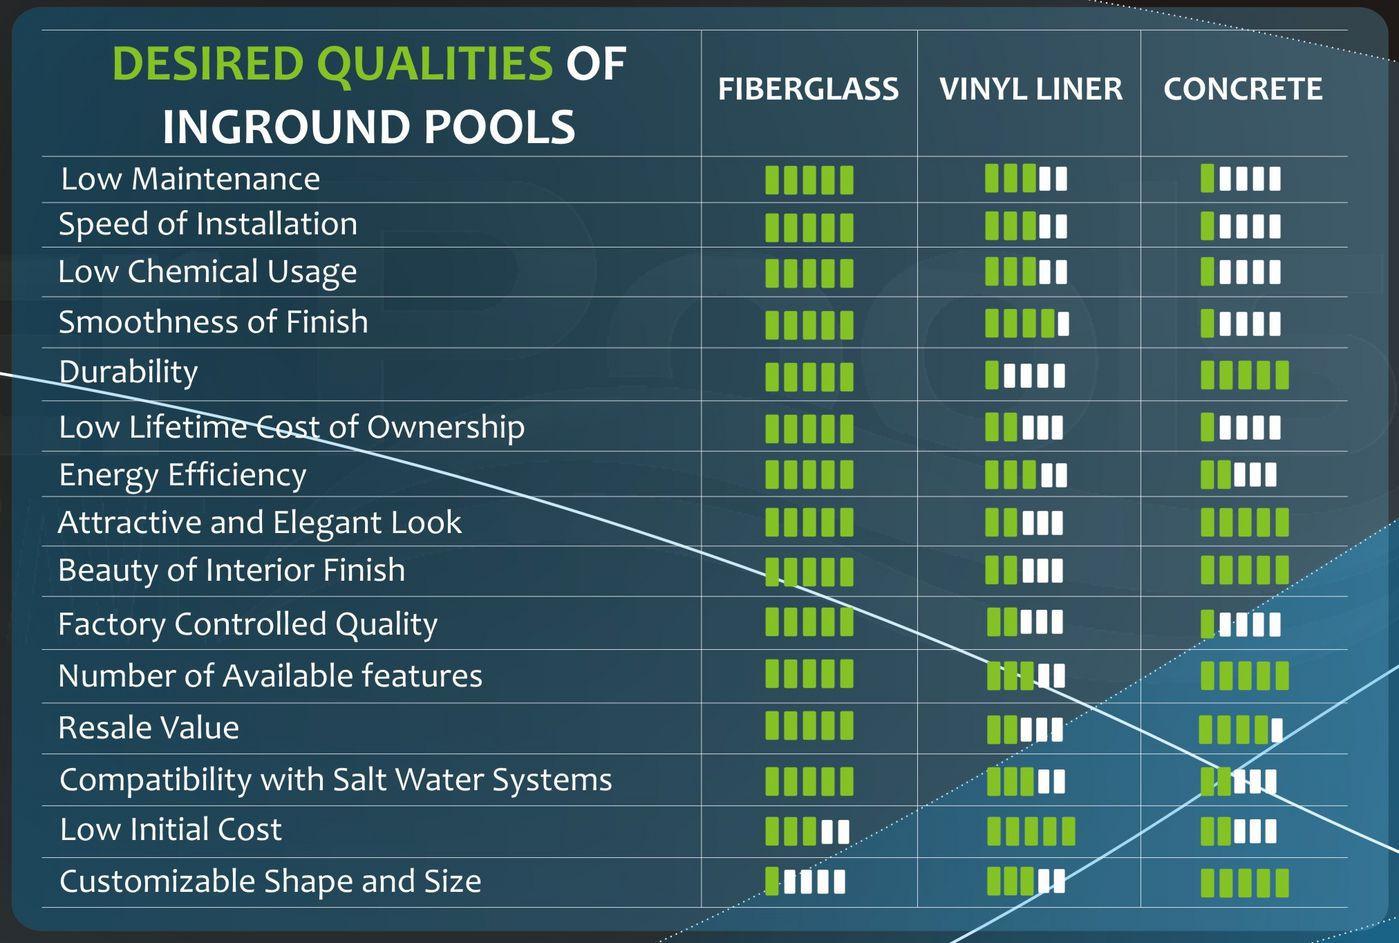 Fiberglass Vs Concrete Vs Vinyl Liner Which Is Best